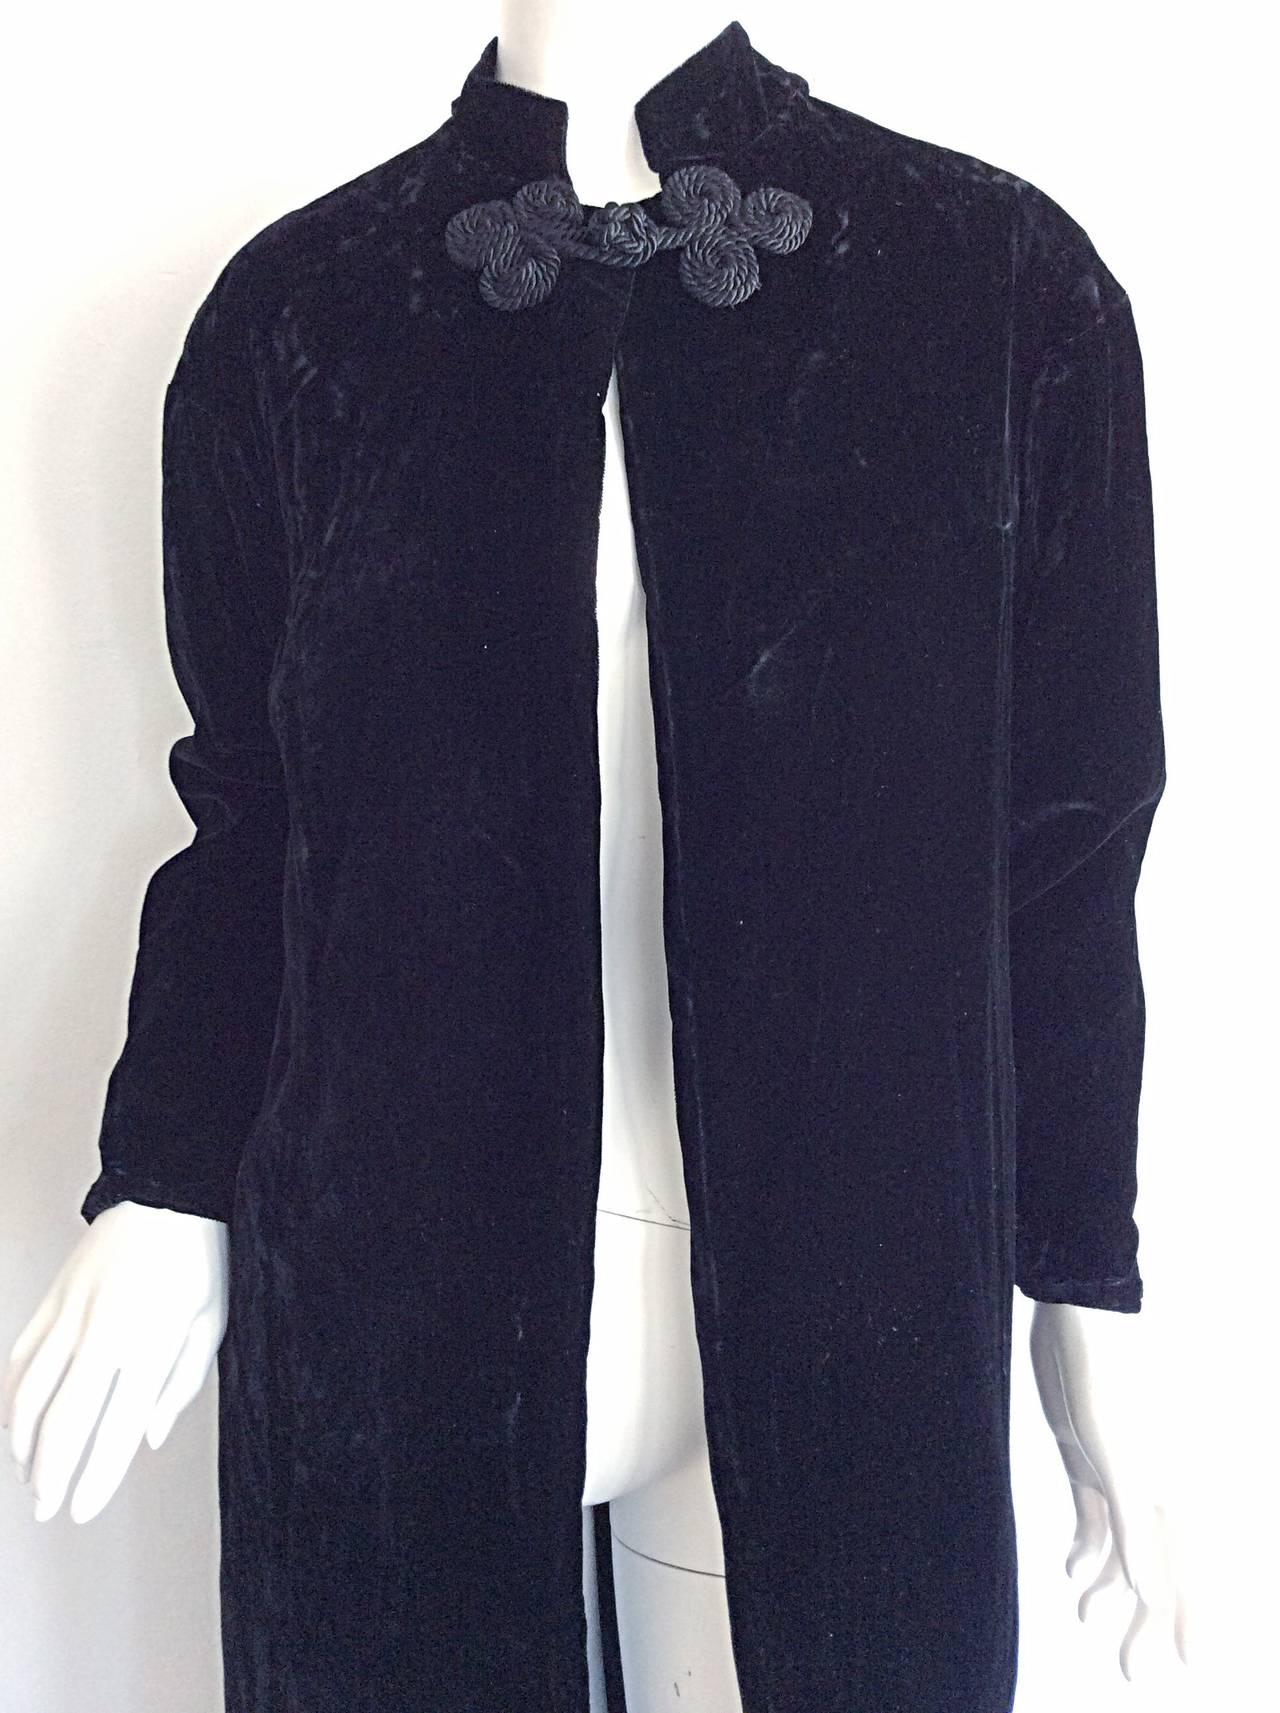 Extremely Rare 1950s Ceil Chapman Black Velvet Milium Cloak Jacket 7